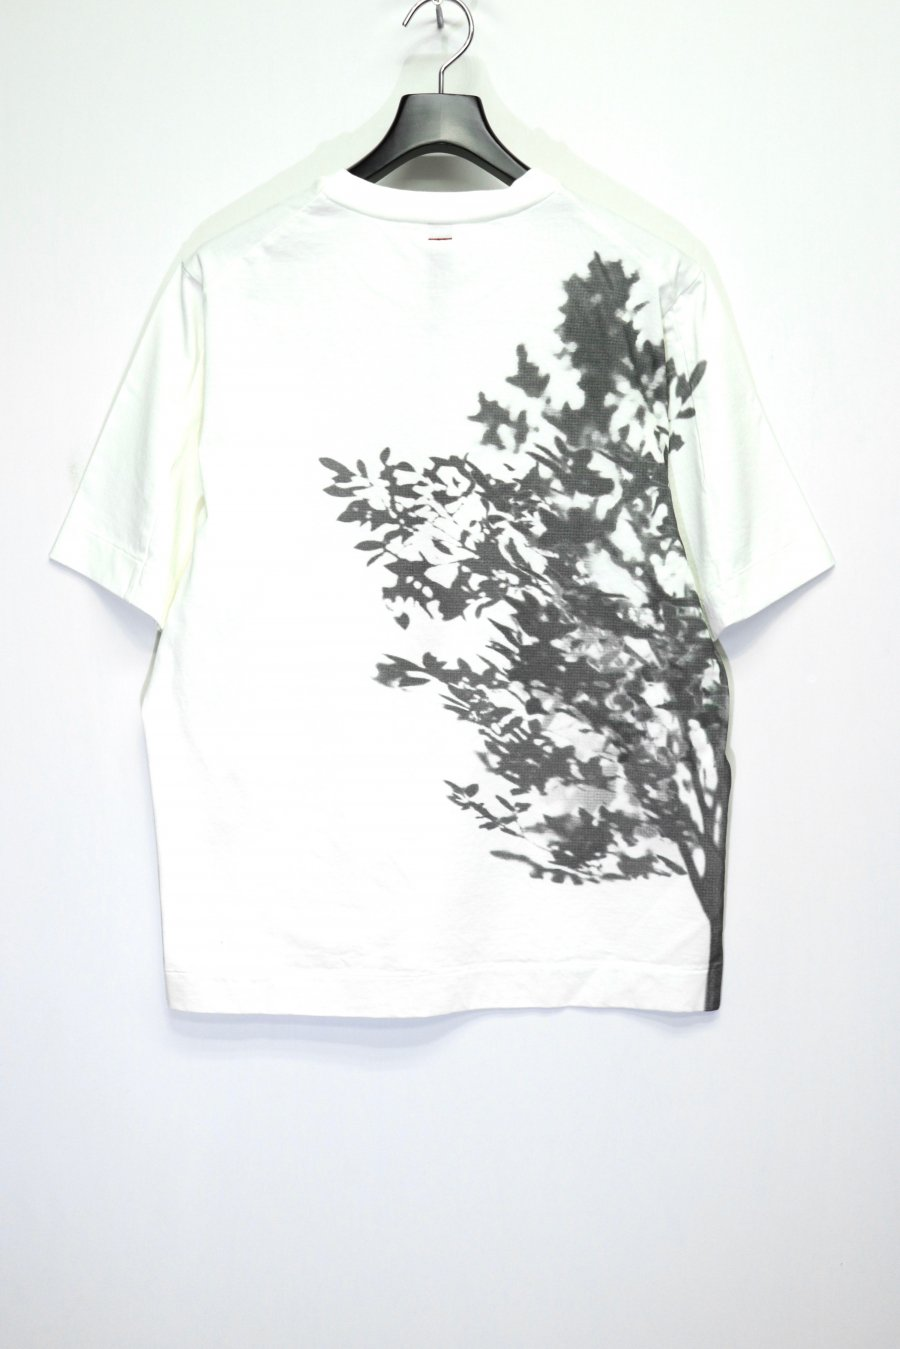 SHINYAKOZUKA  TREE<img class='new_mark_img2' src='https://img.shop-pro.jp/img/new/icons15.gif' style='border:none;display:inline;margin:0px;padding:0px;width:auto;' />